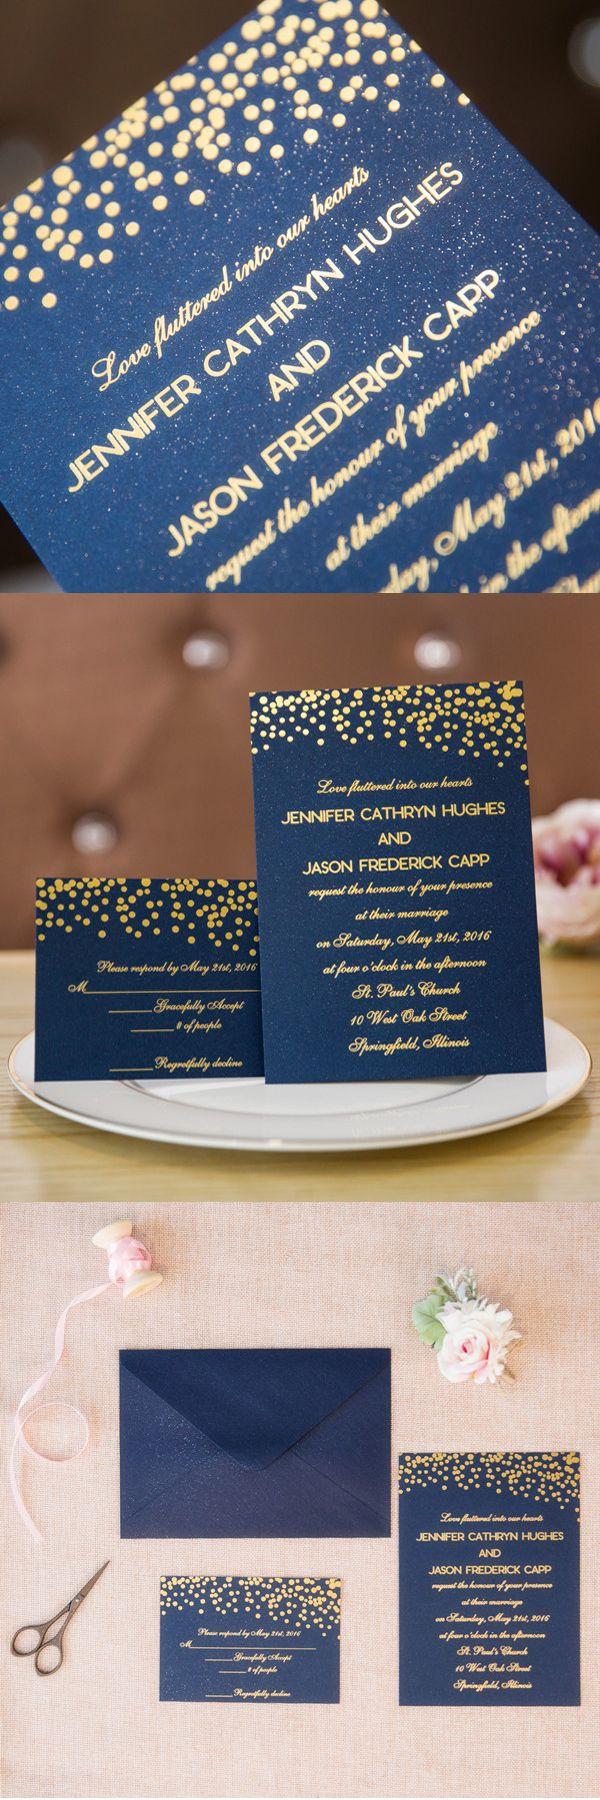 matrimonial resume format%0A foil gold polka dots and navy blue wedding invitation